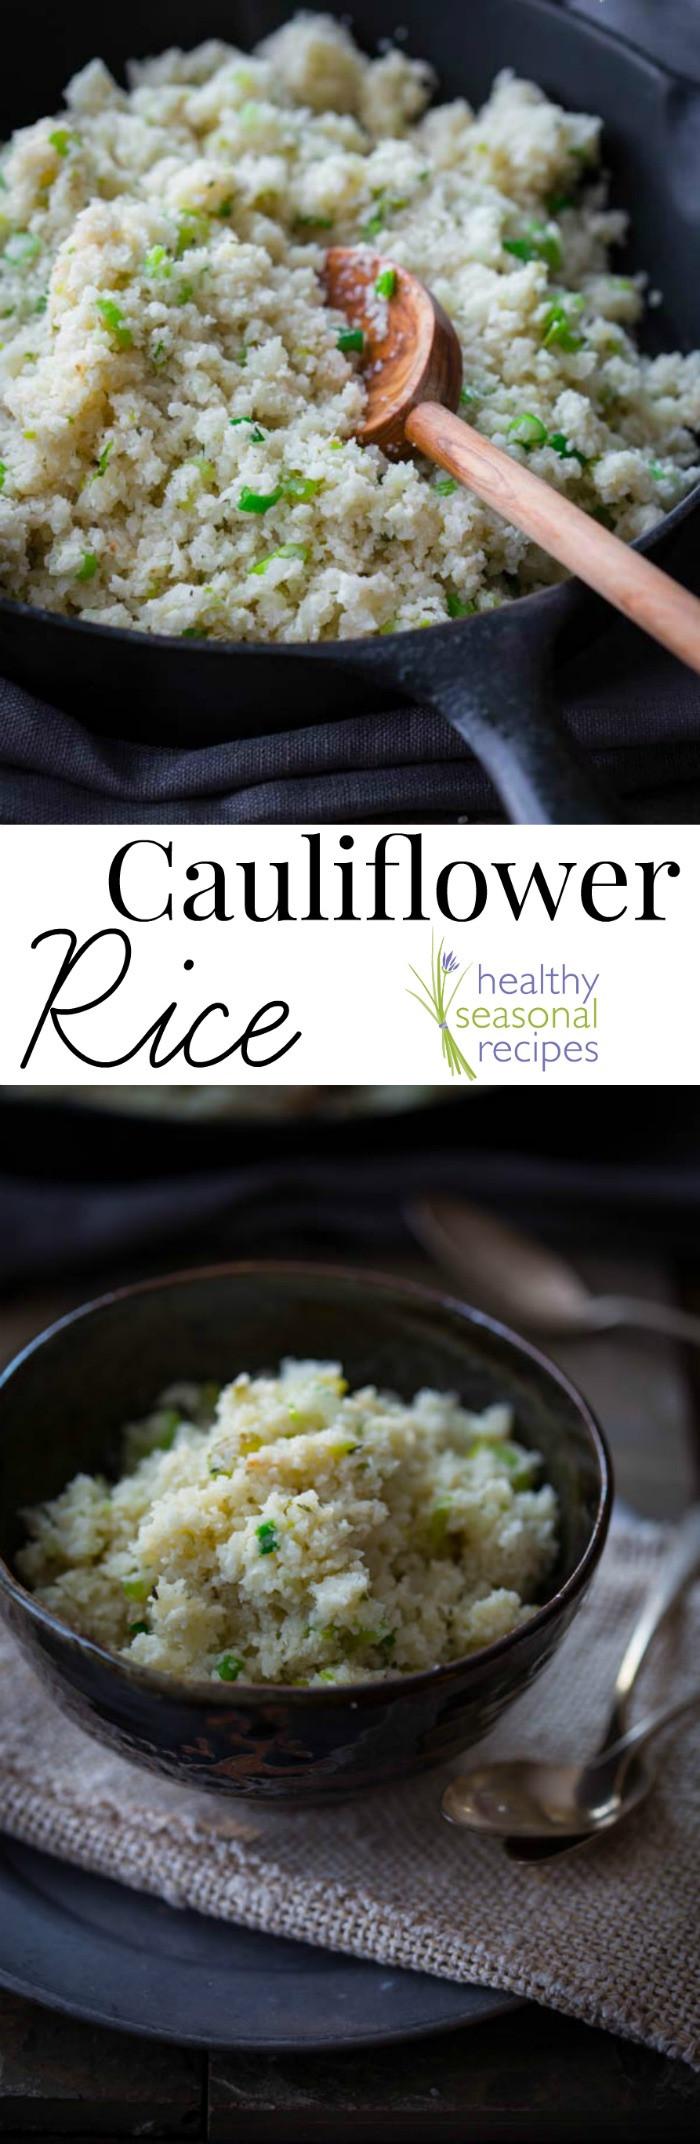 Healthy Cauliflower Recipes  cauliflower rice Healthy Seasonal Recipes